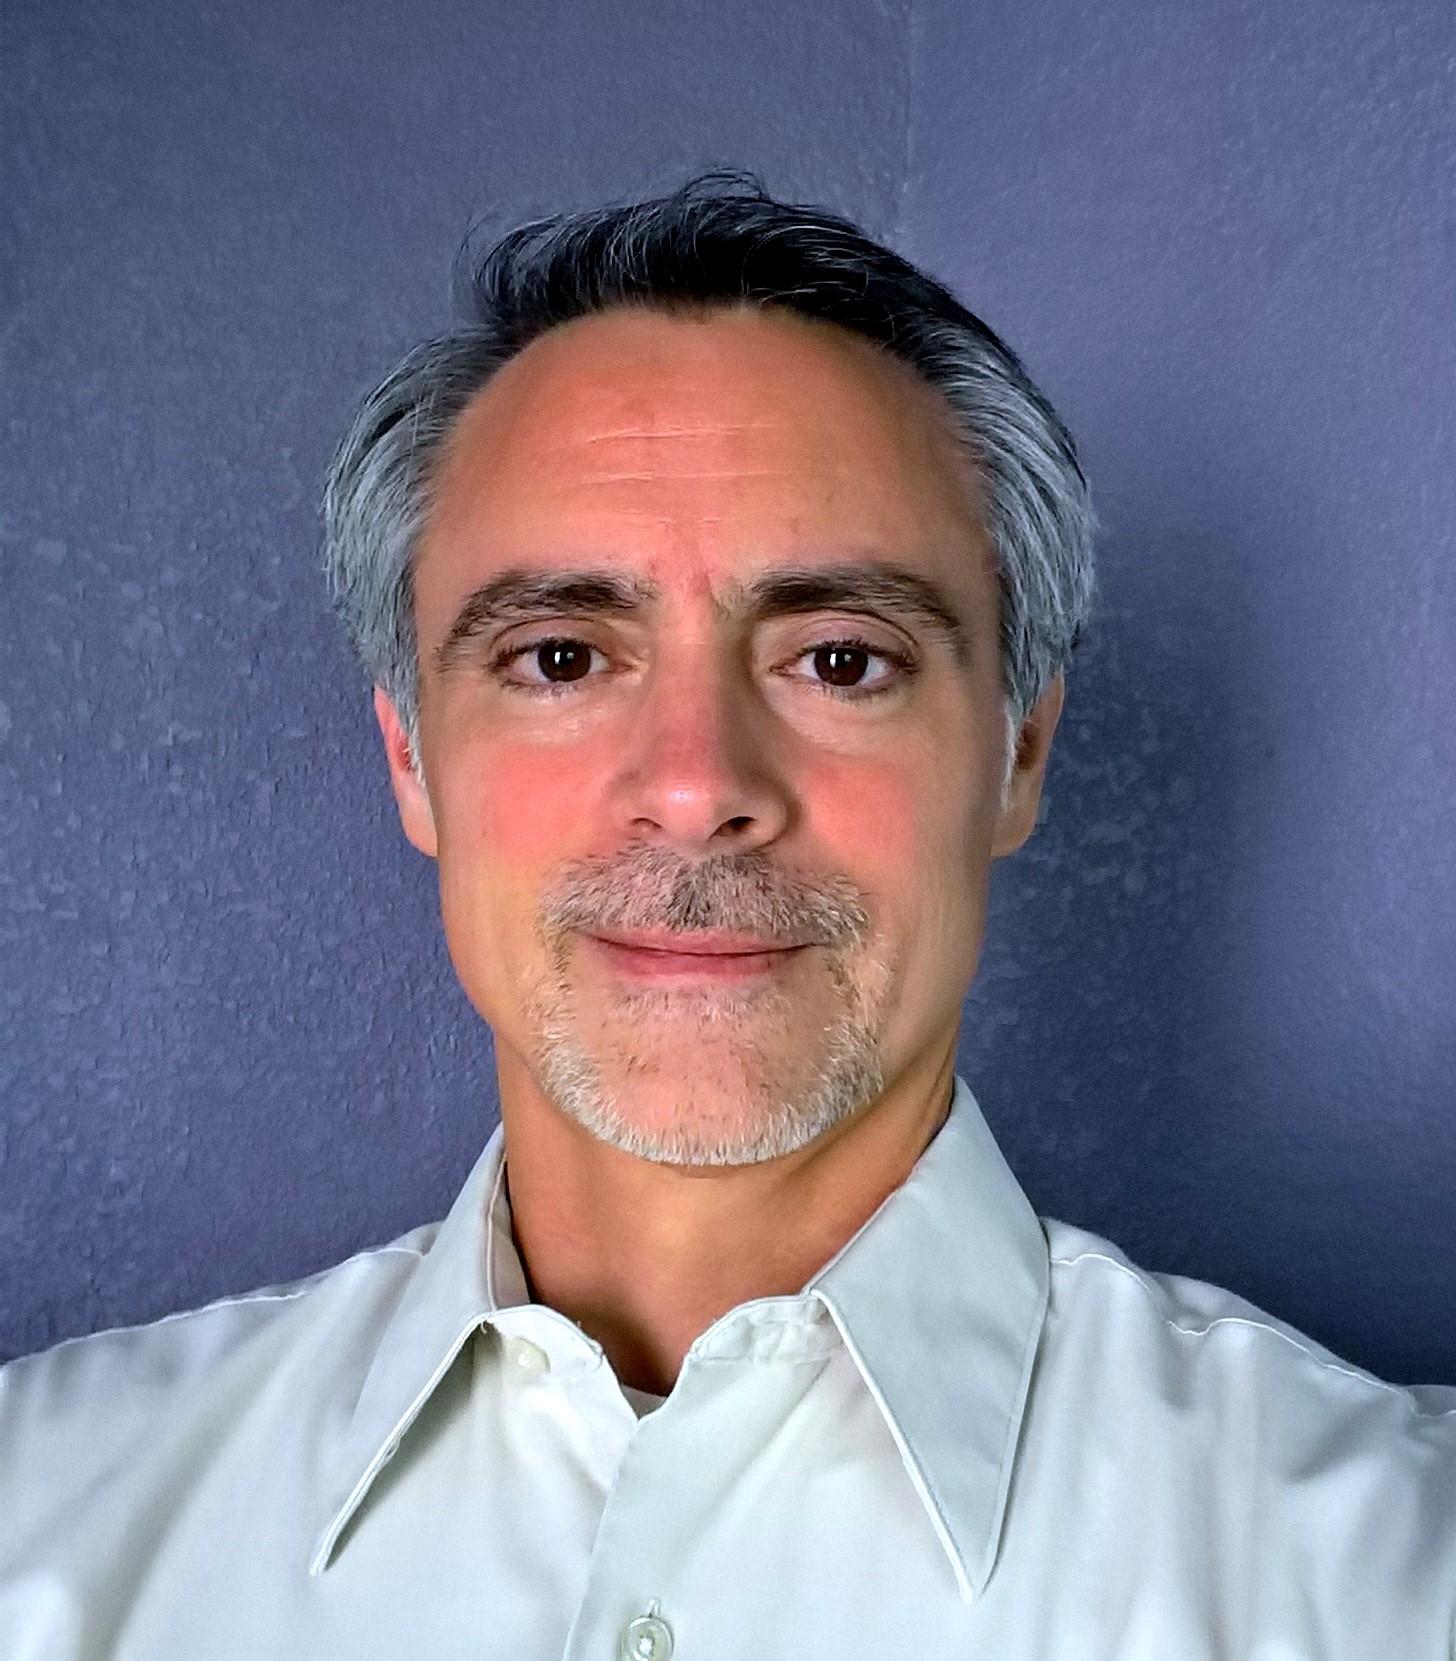 Jeff D'Arco